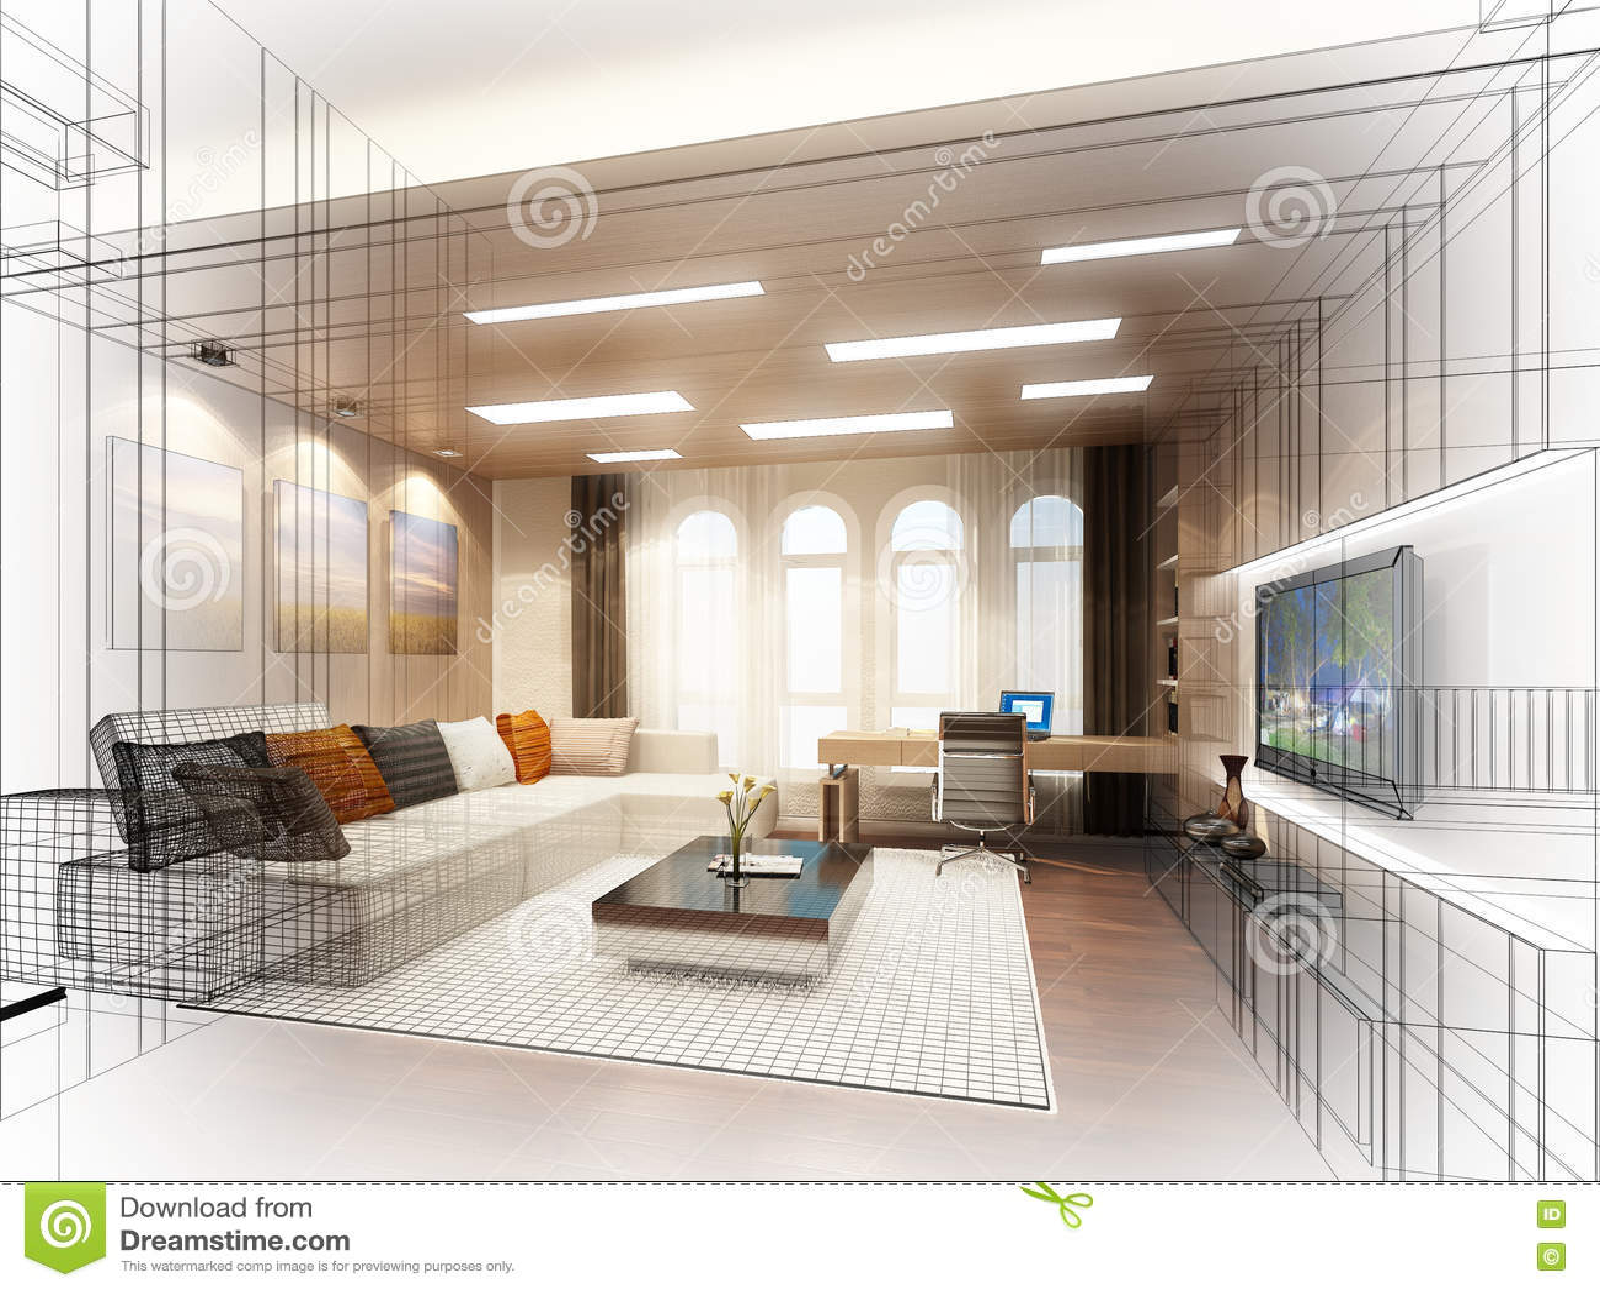 Sketch Design Of Living Room 3dwire Frame Stock